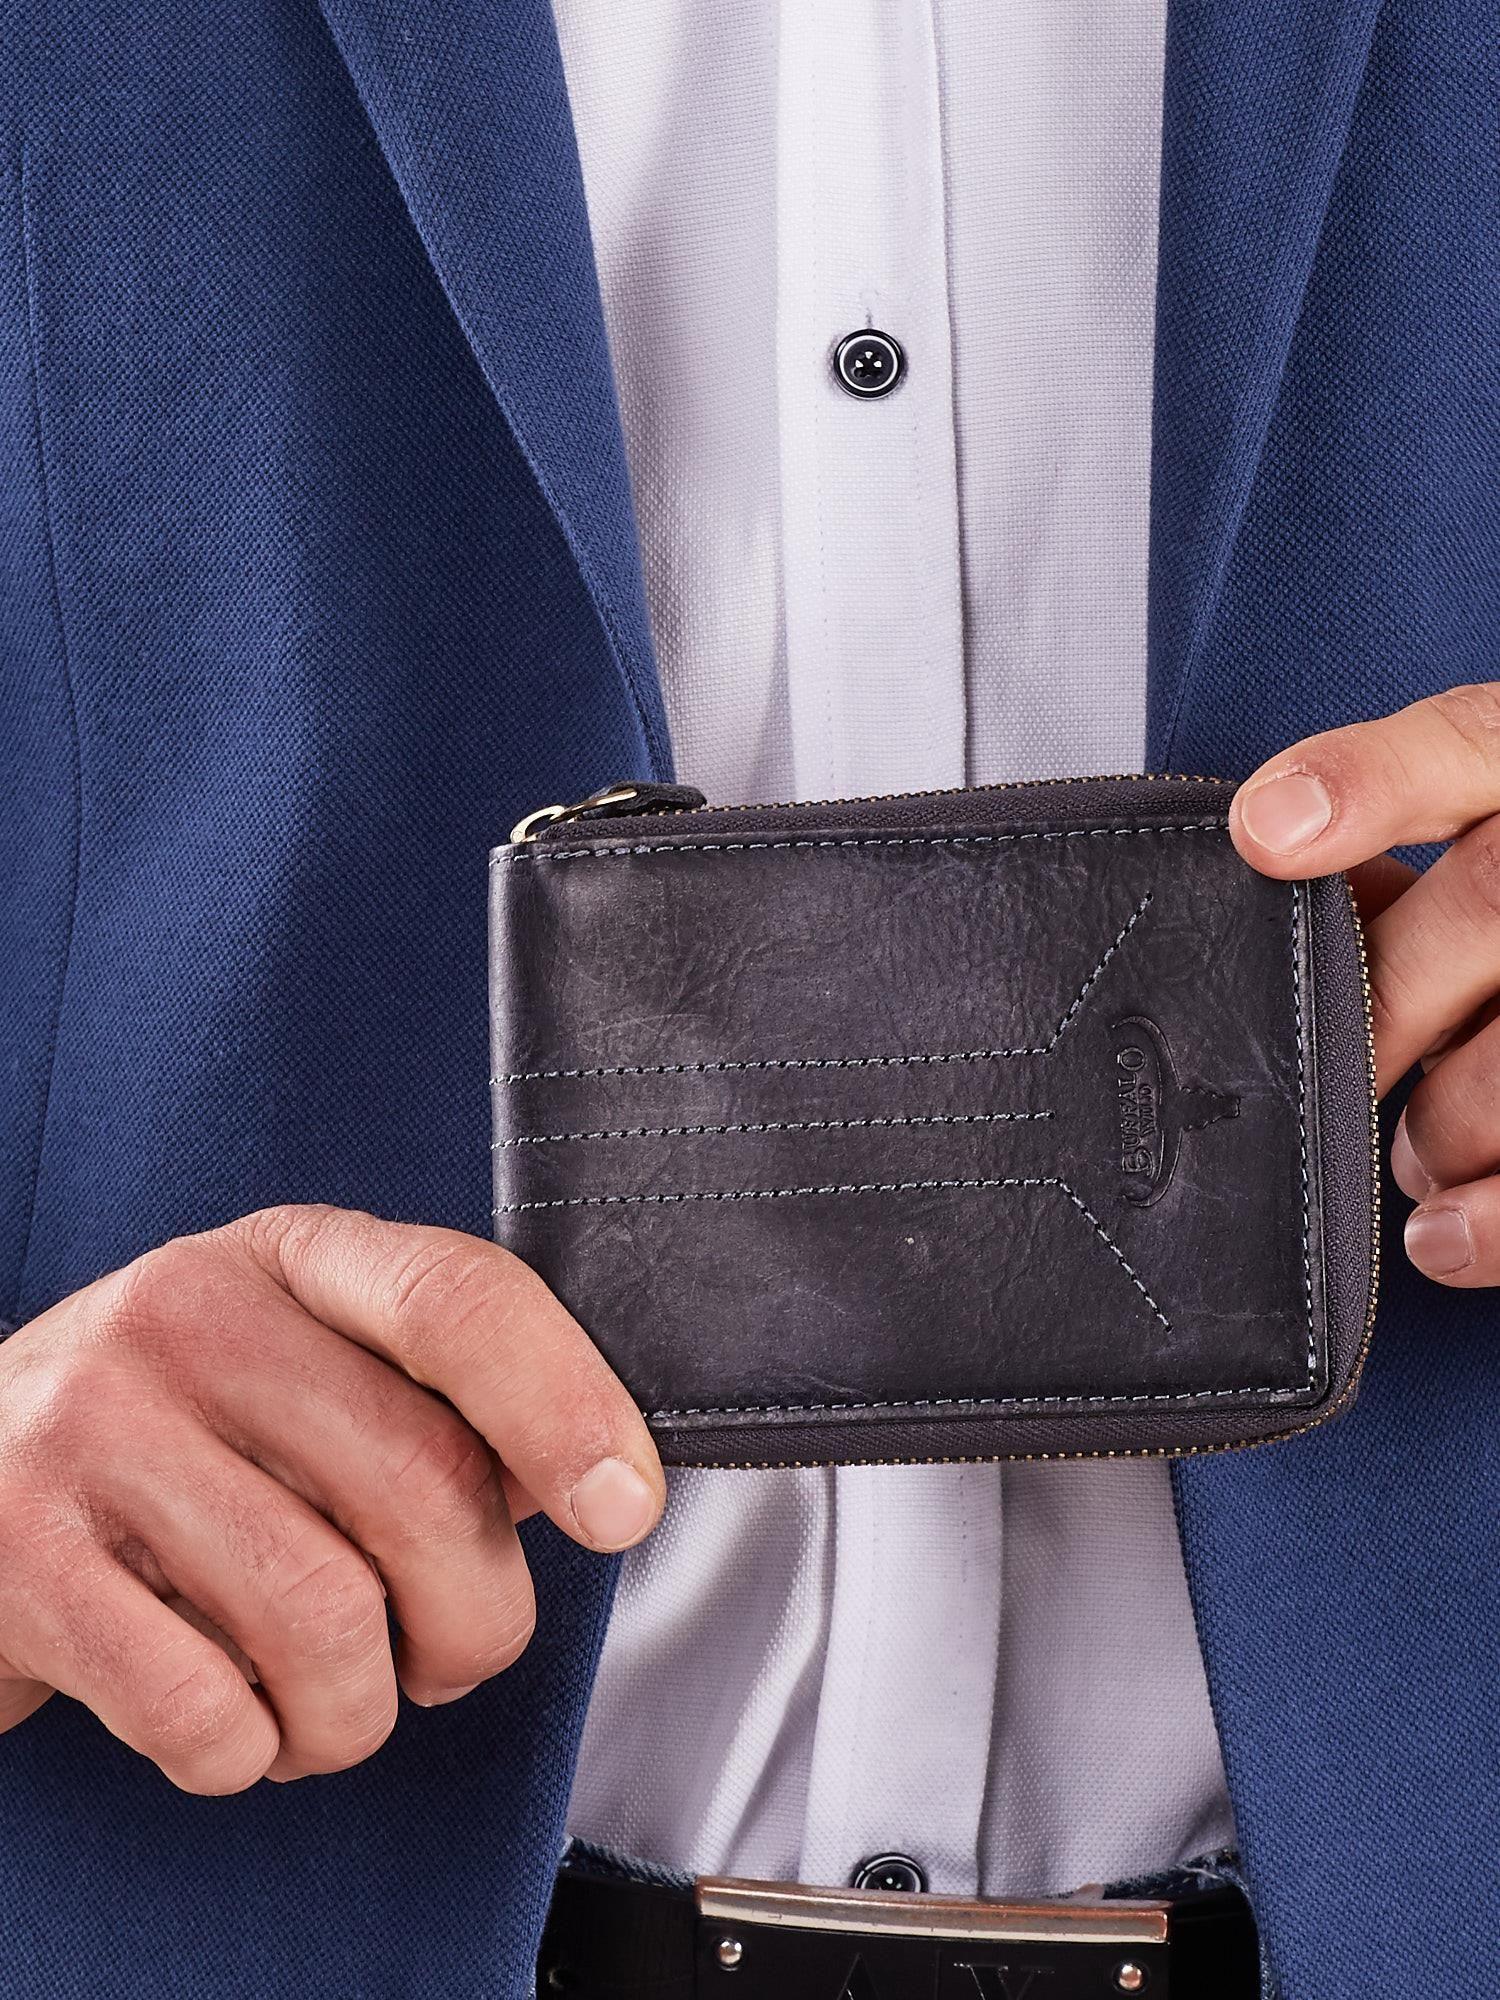 Pánska peňaženka na zips, tmavo modrá jedna velikost